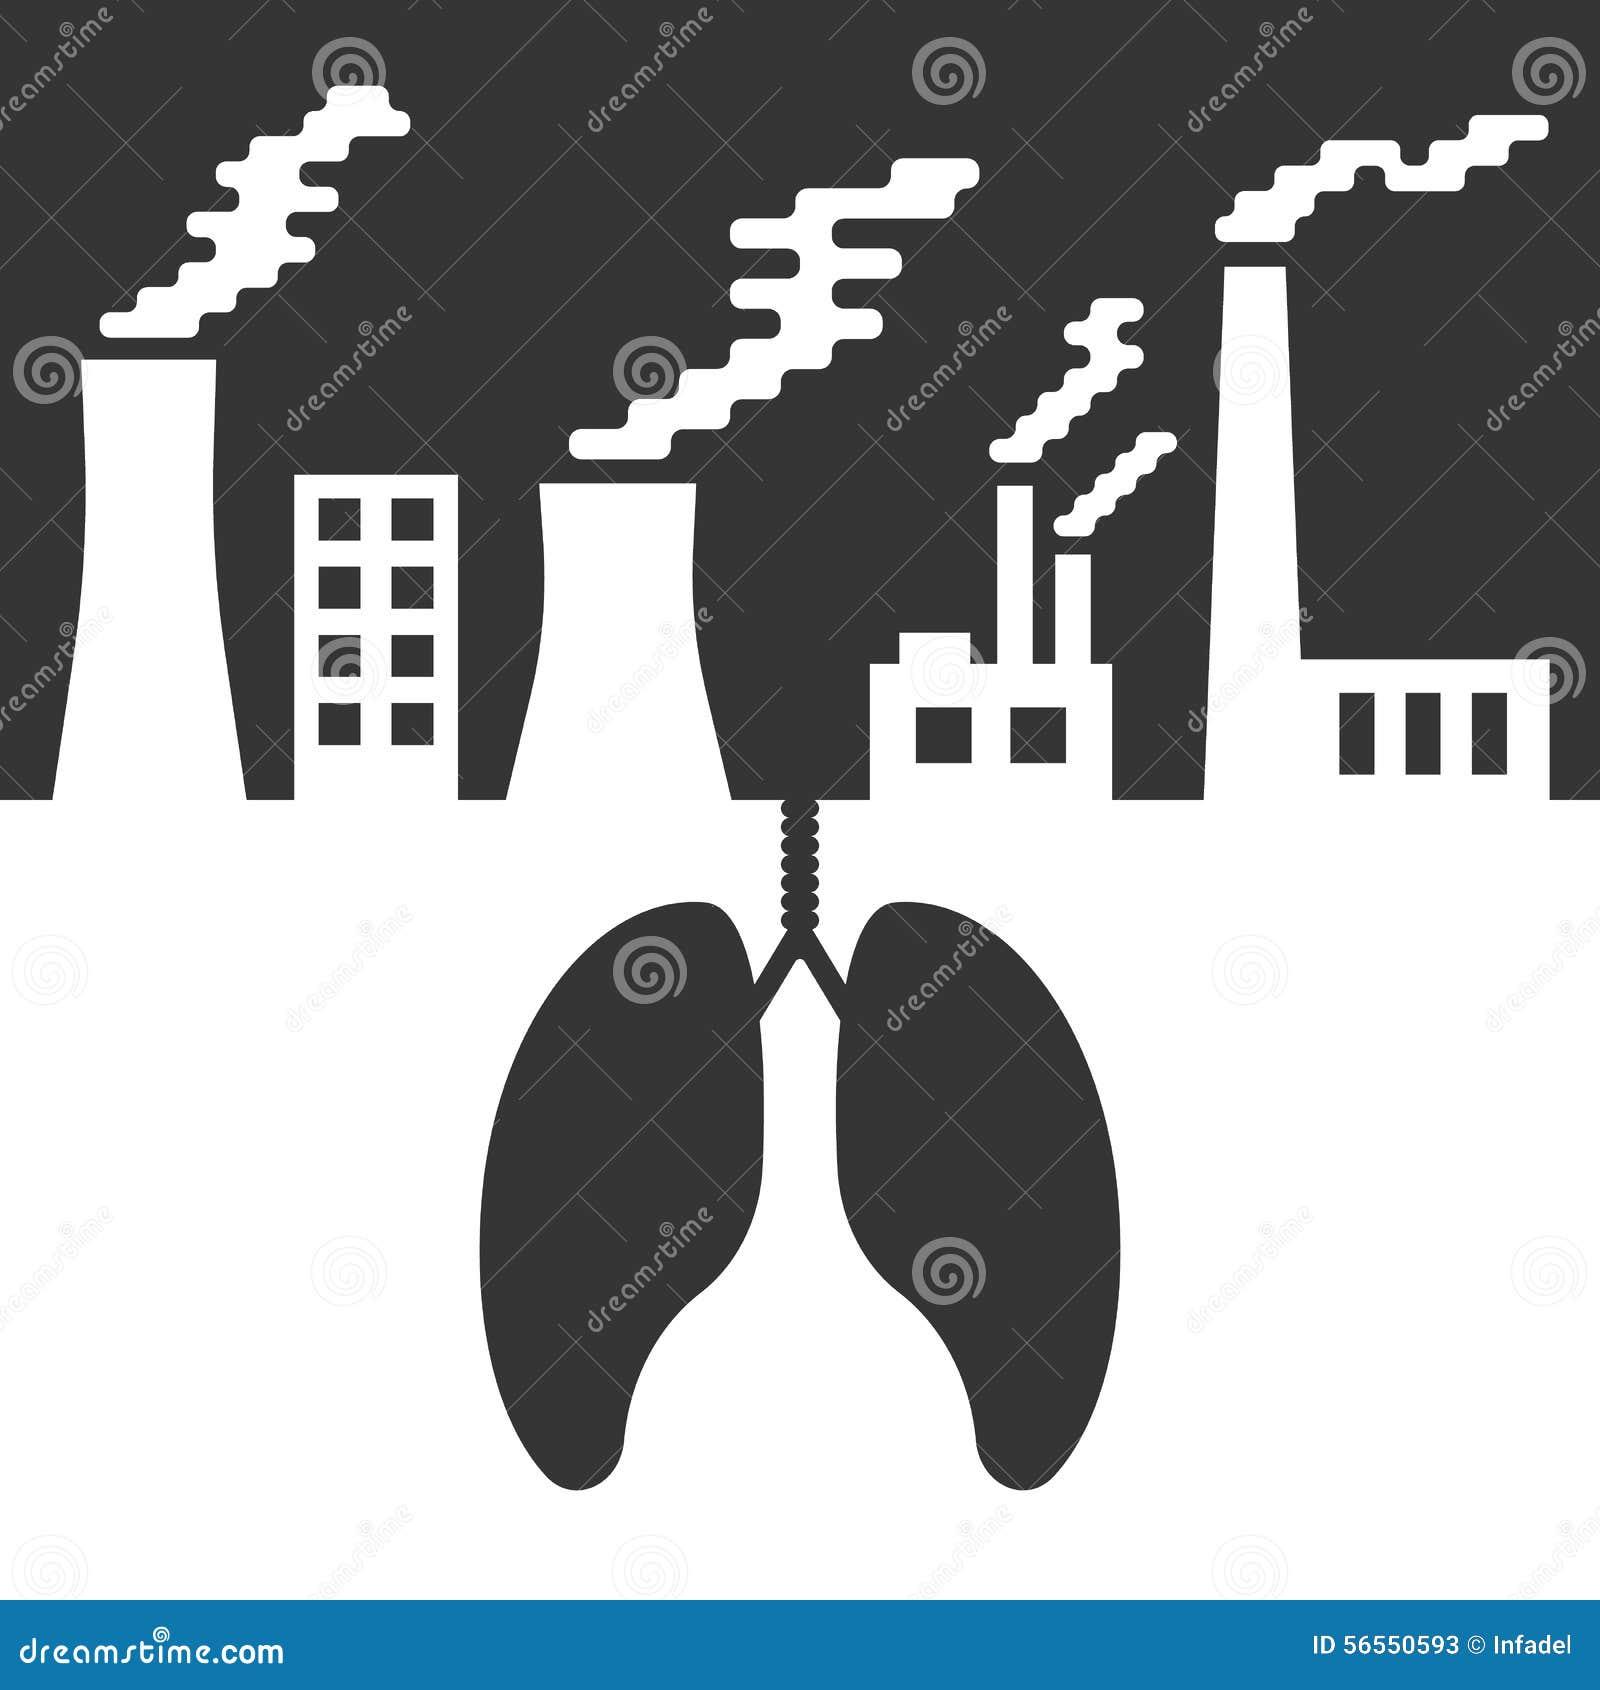 Download Περιβαλλοντολογικά θέματα με τους πνεύμονες και την ατμοσφαιρική ρύπανση Διανυσματική απεικόνιση - εικονογραφία από απεικόνιση, ρύπανση: 56550593